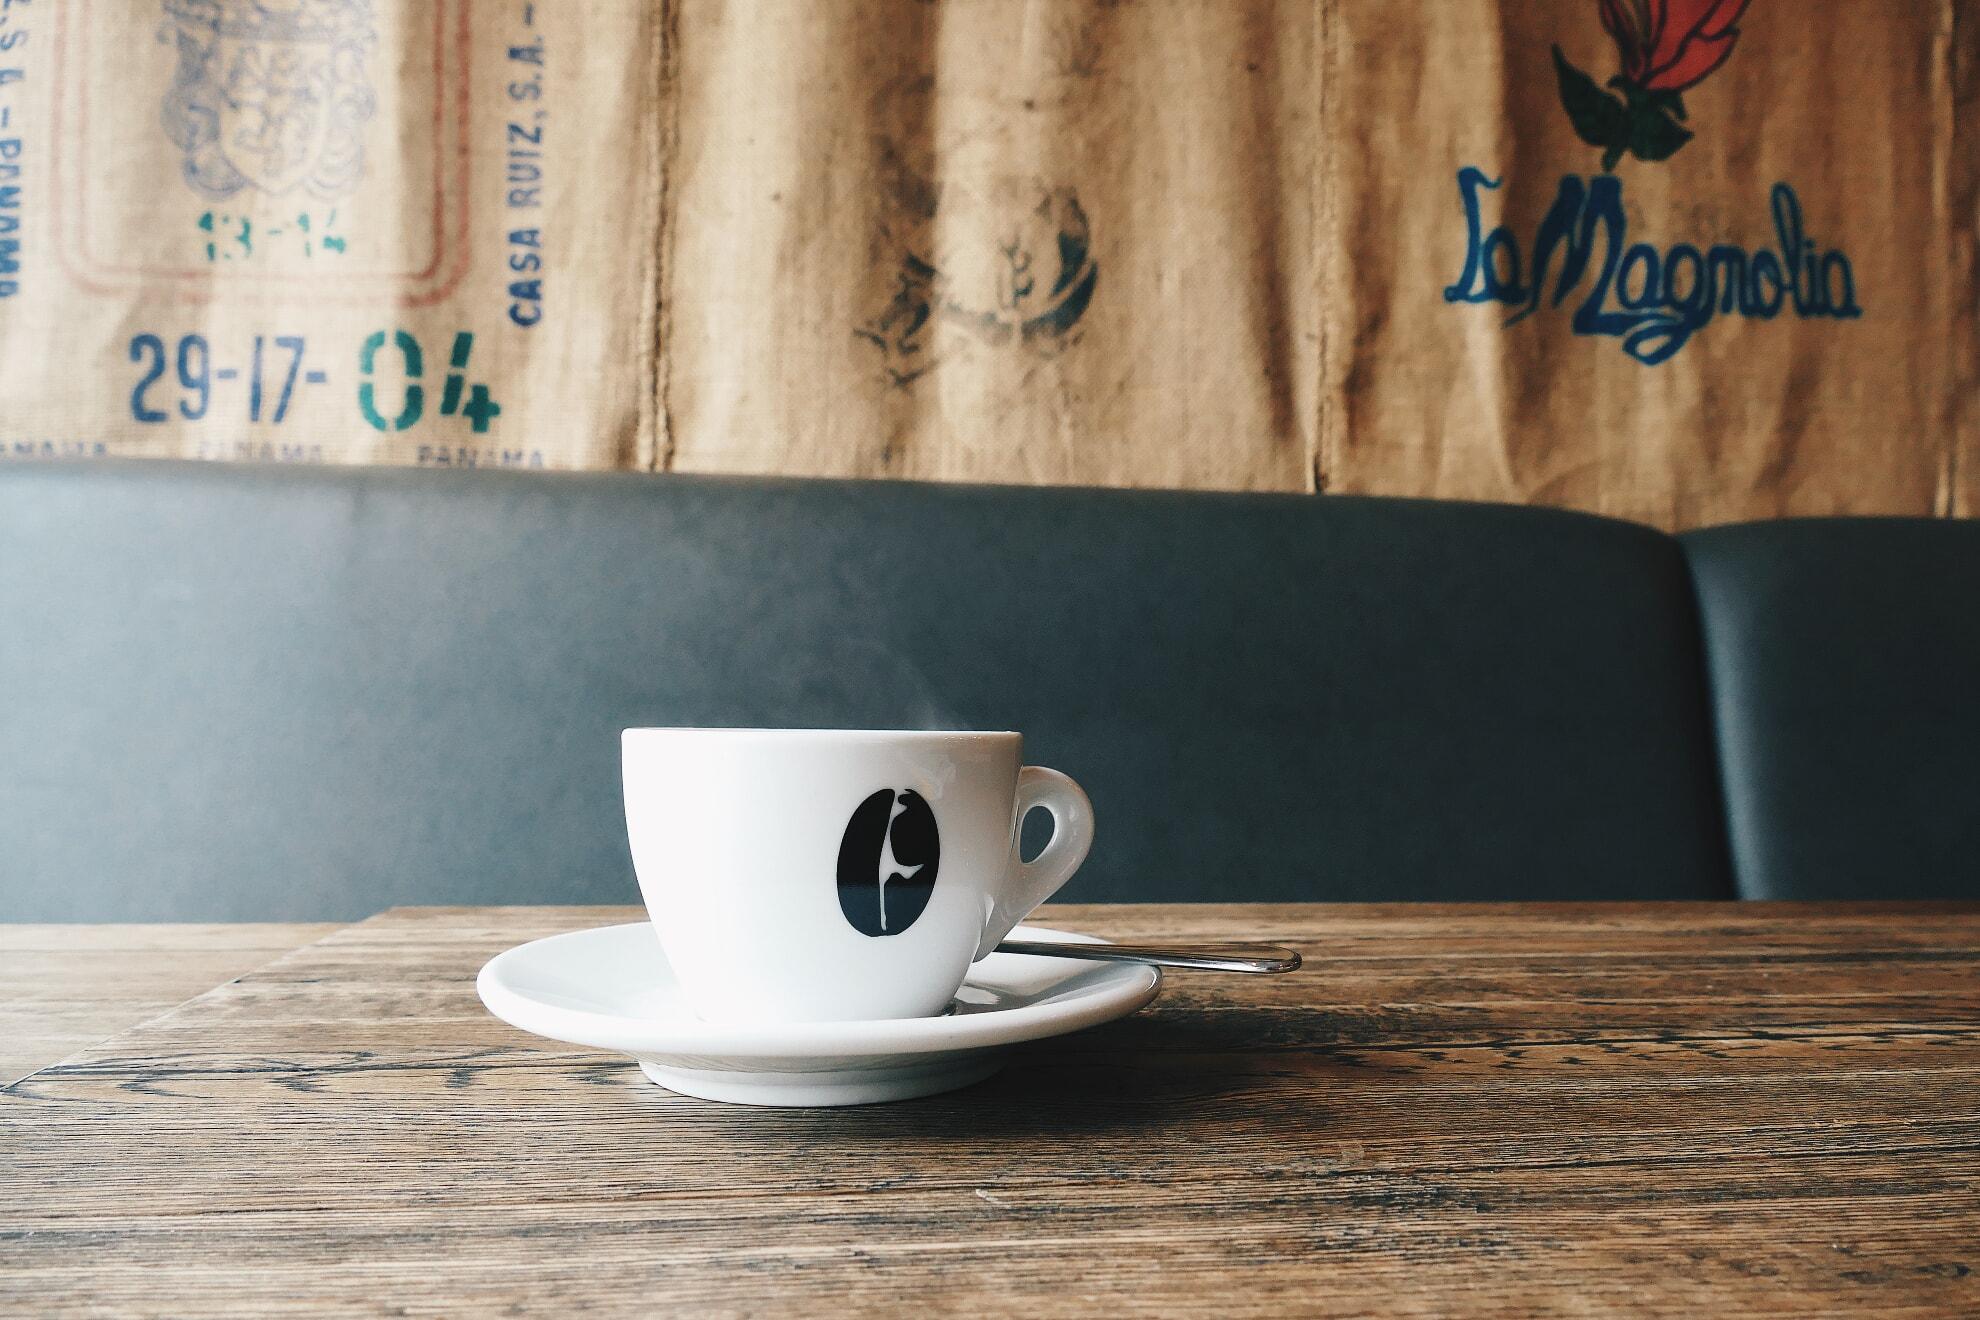 © Sylt Marketing l Julia Petersen_Tasse der Kaffeerösterei Rantum